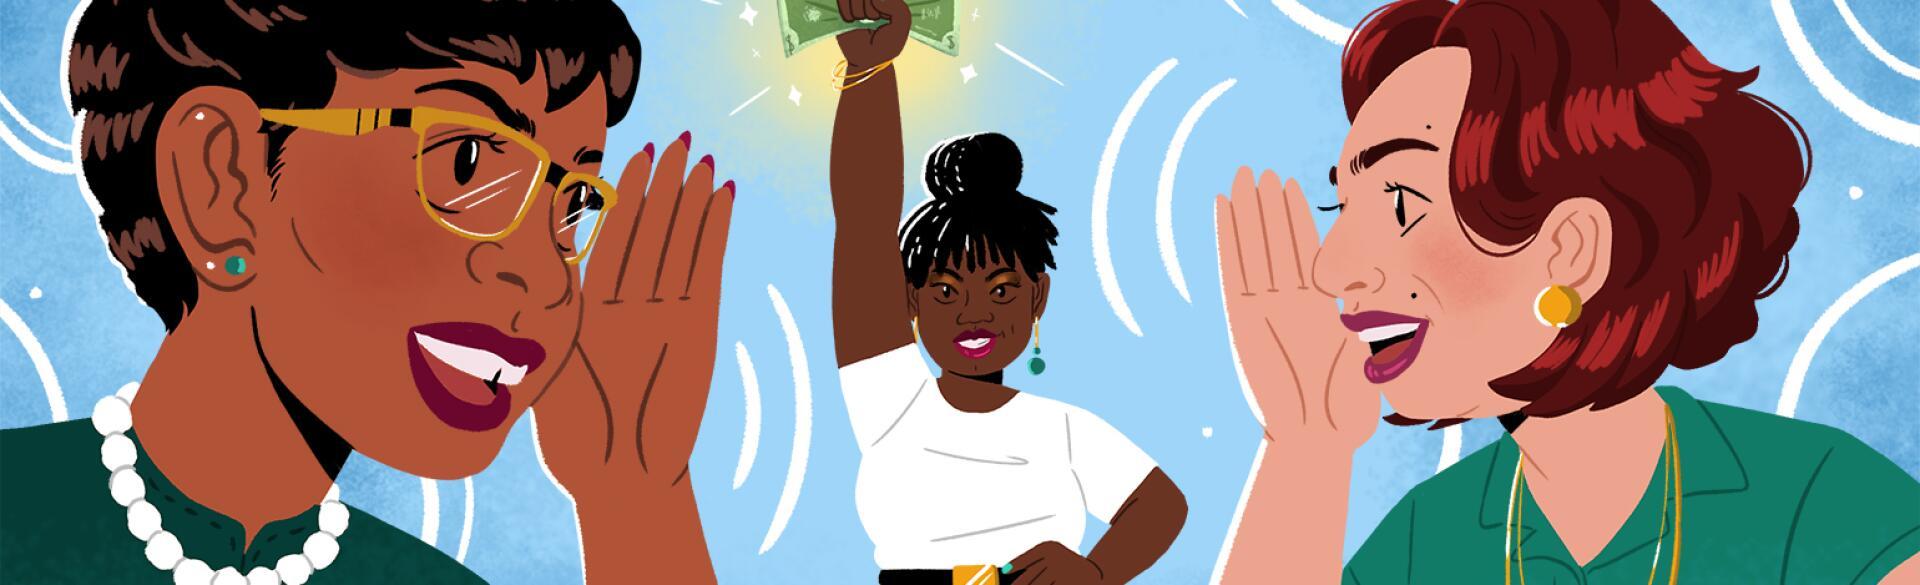 Illustration_women_salary_talking_Shannon_Wright_1540x600.jpg